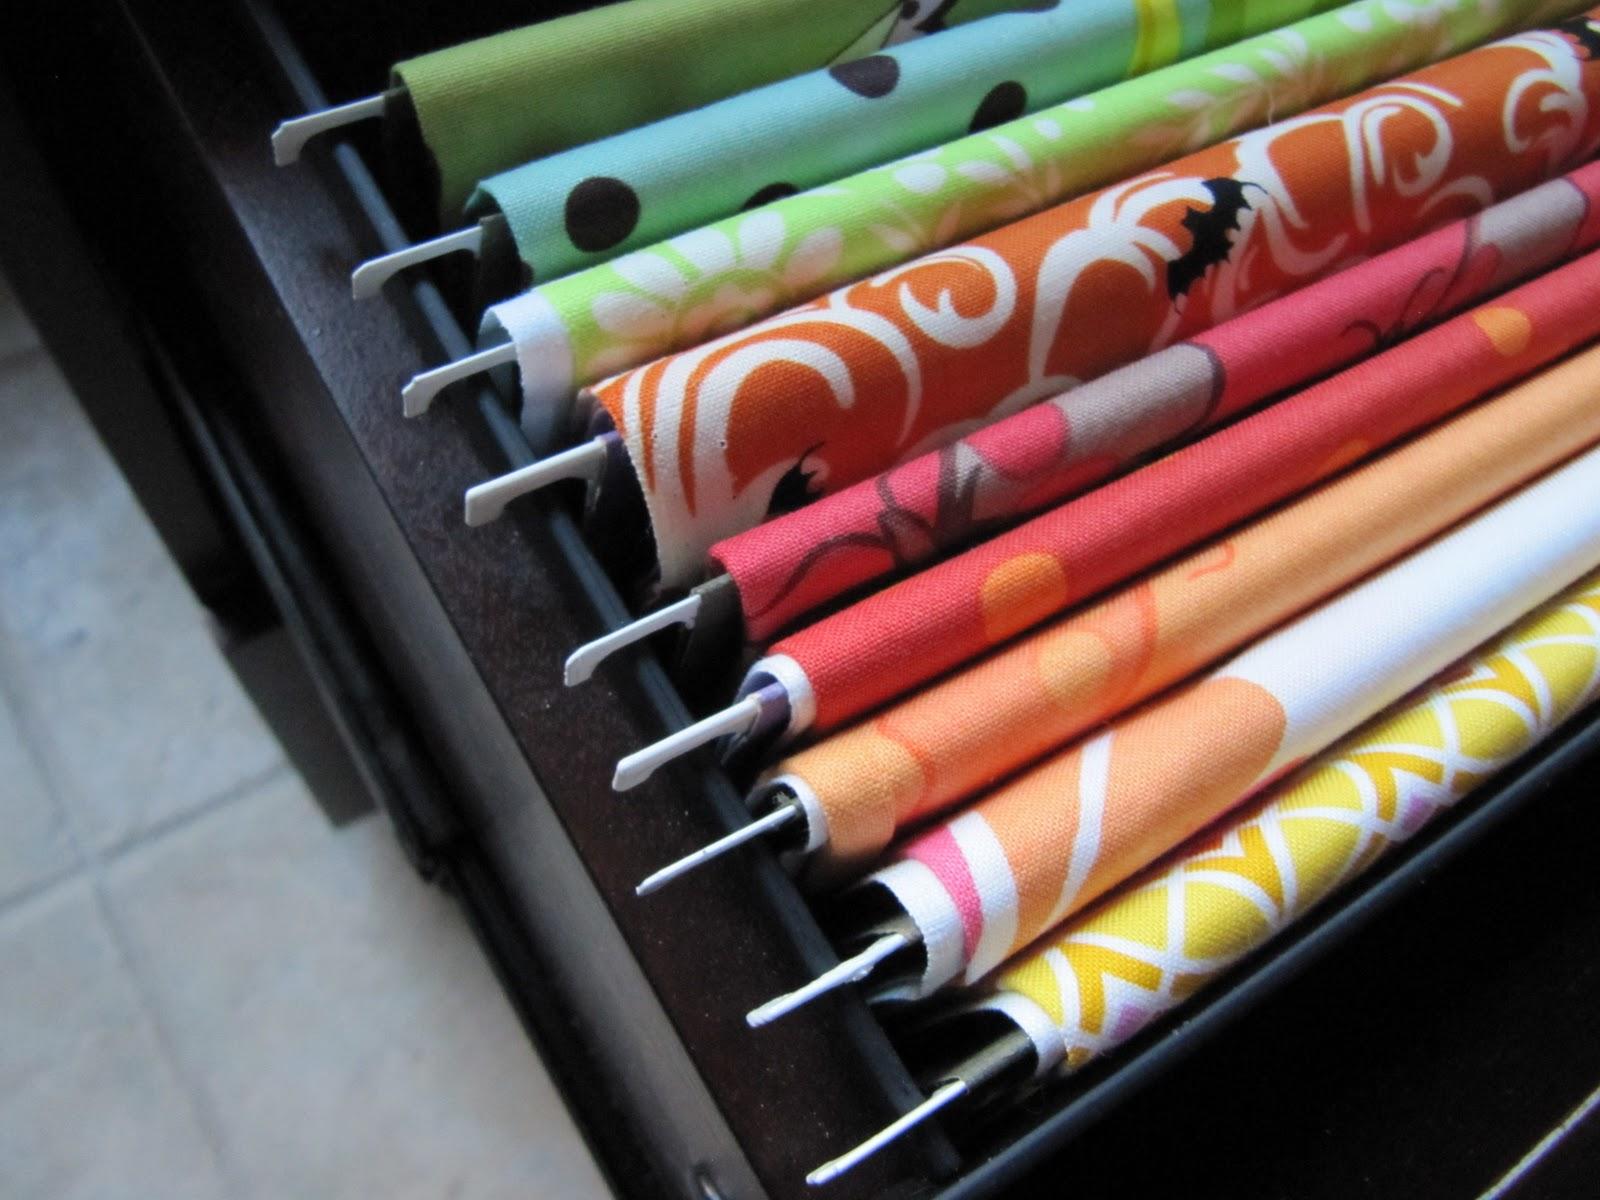 http://1.bp.blogspot.com/-WcBjkC4uY30/T77Vjiyr6II/AAAAAAAAEqs/9lWriQPmq4Q/s1600/file+your+fabric+030.jpg